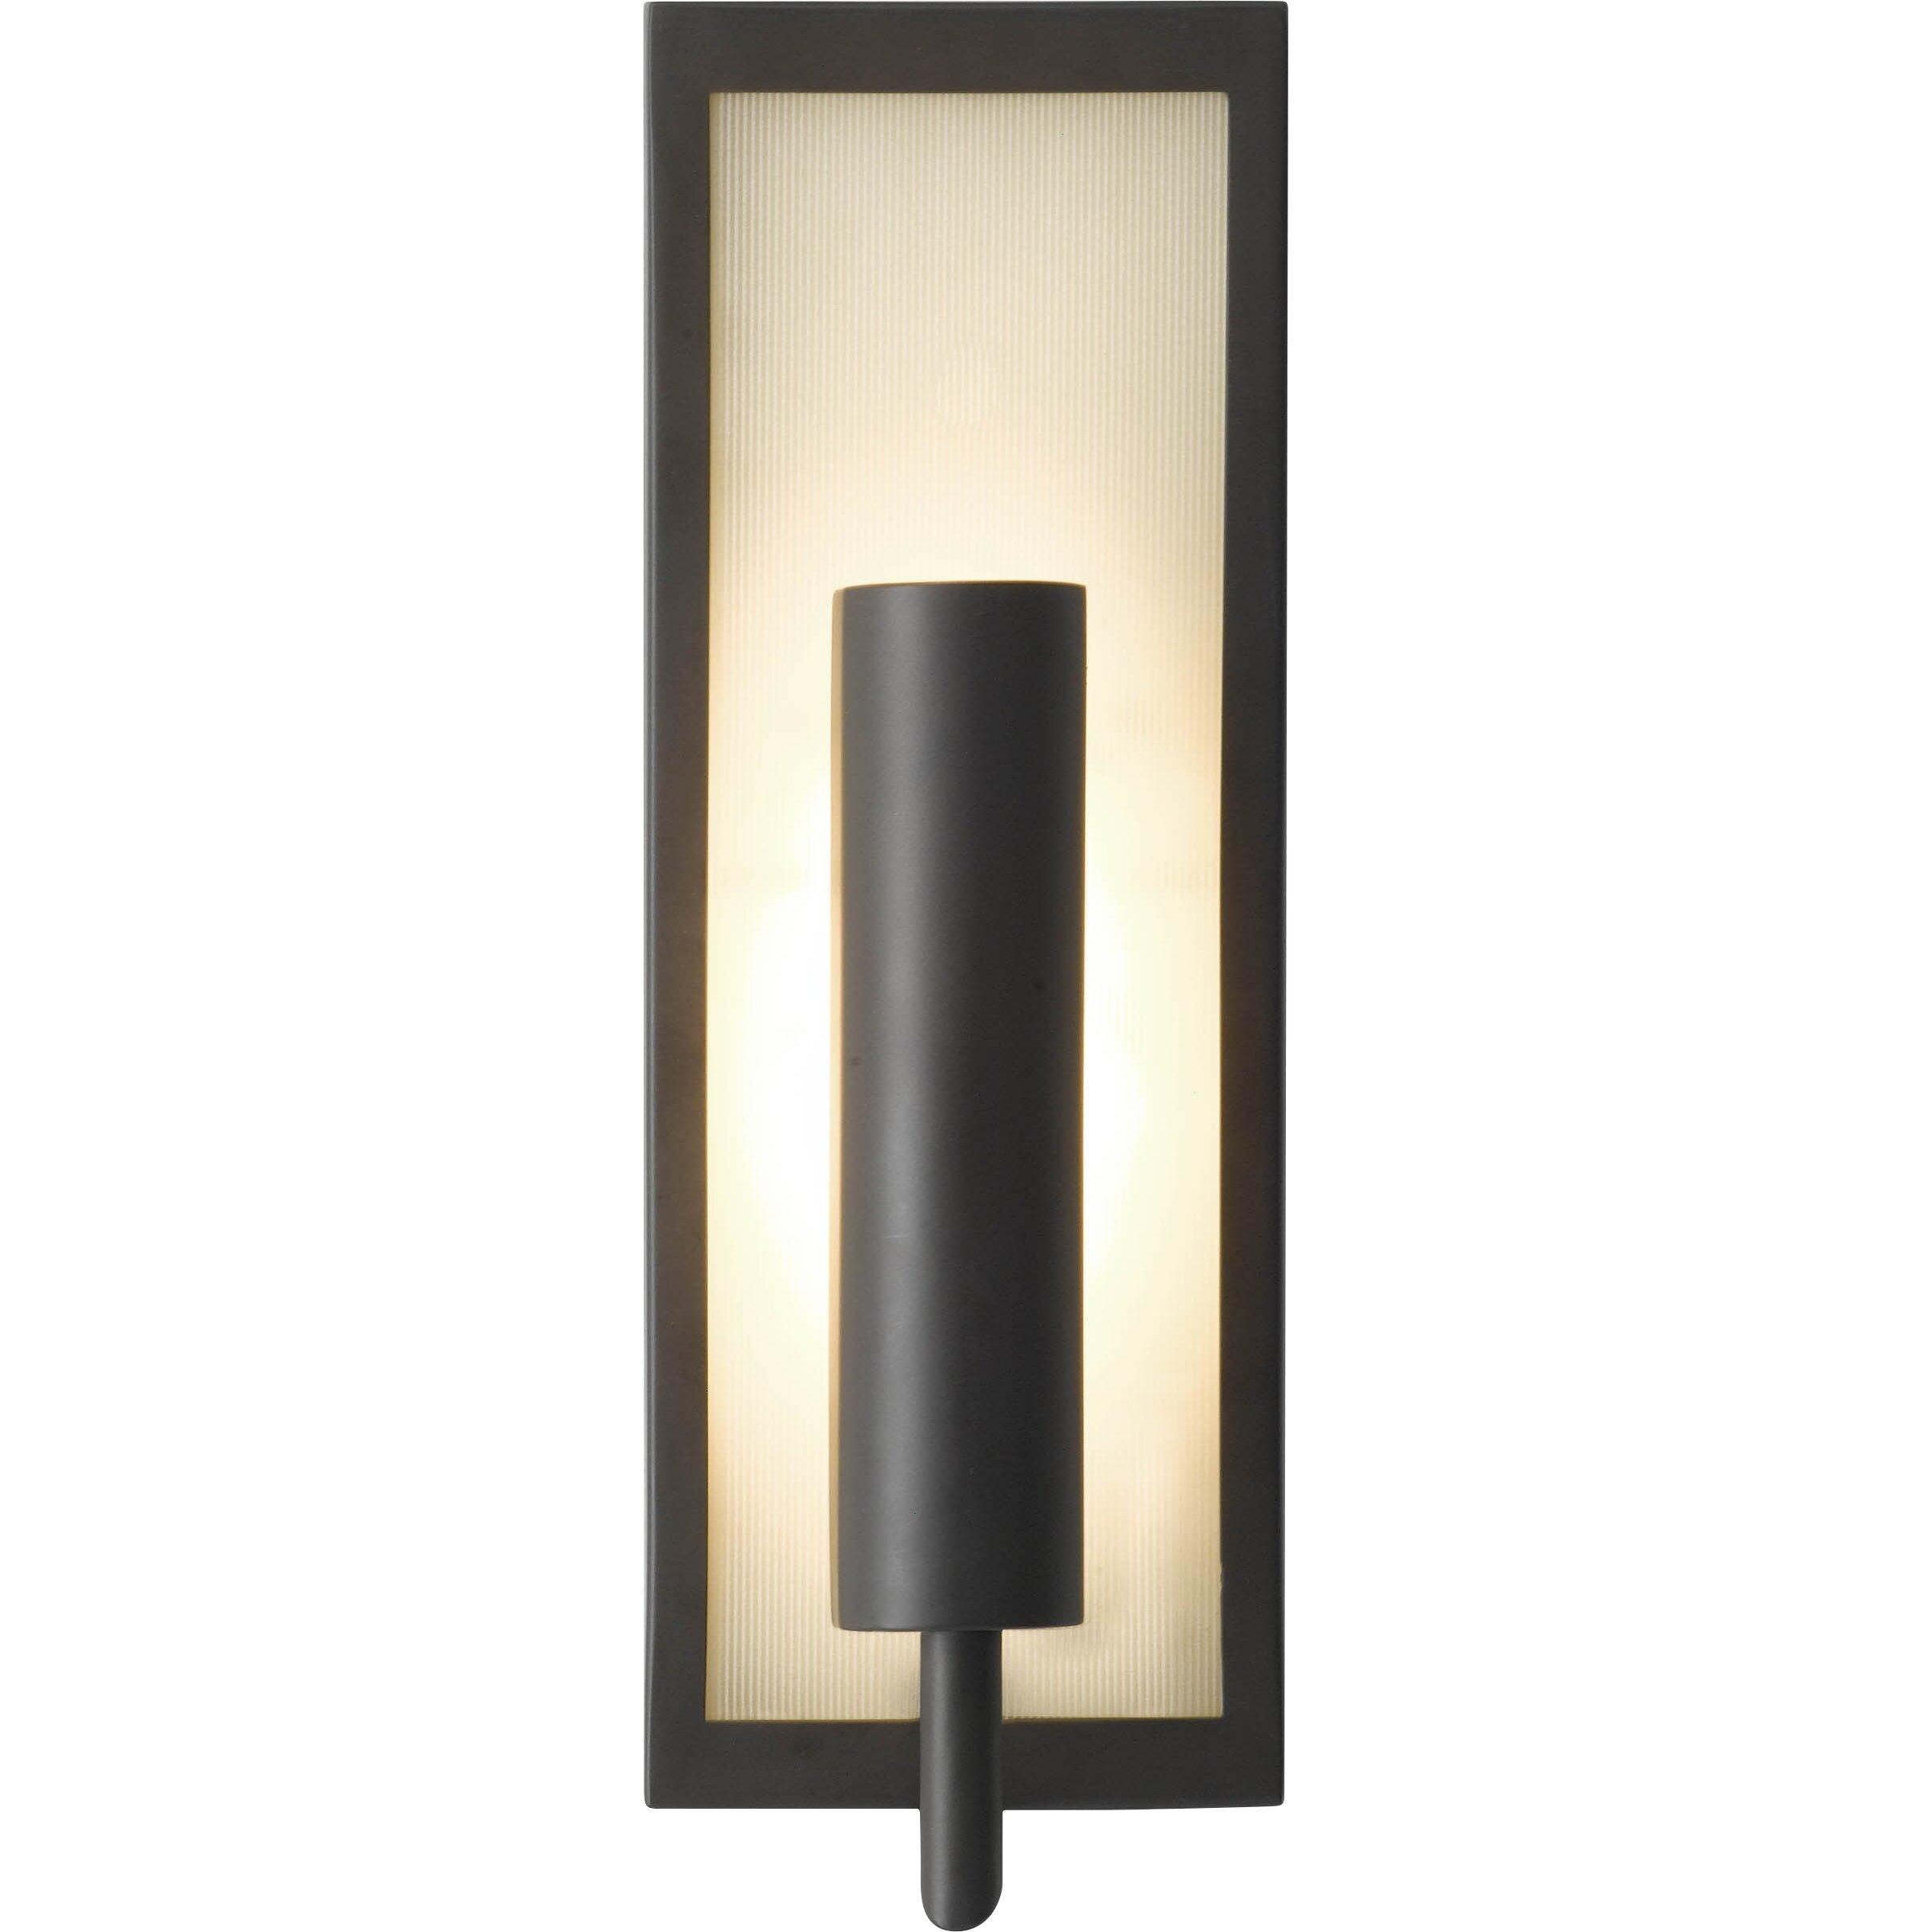 Feiss Bathroom Wall Sconces : Feiss Mila 1 Light Wall Sconce & Reviews Wayfair